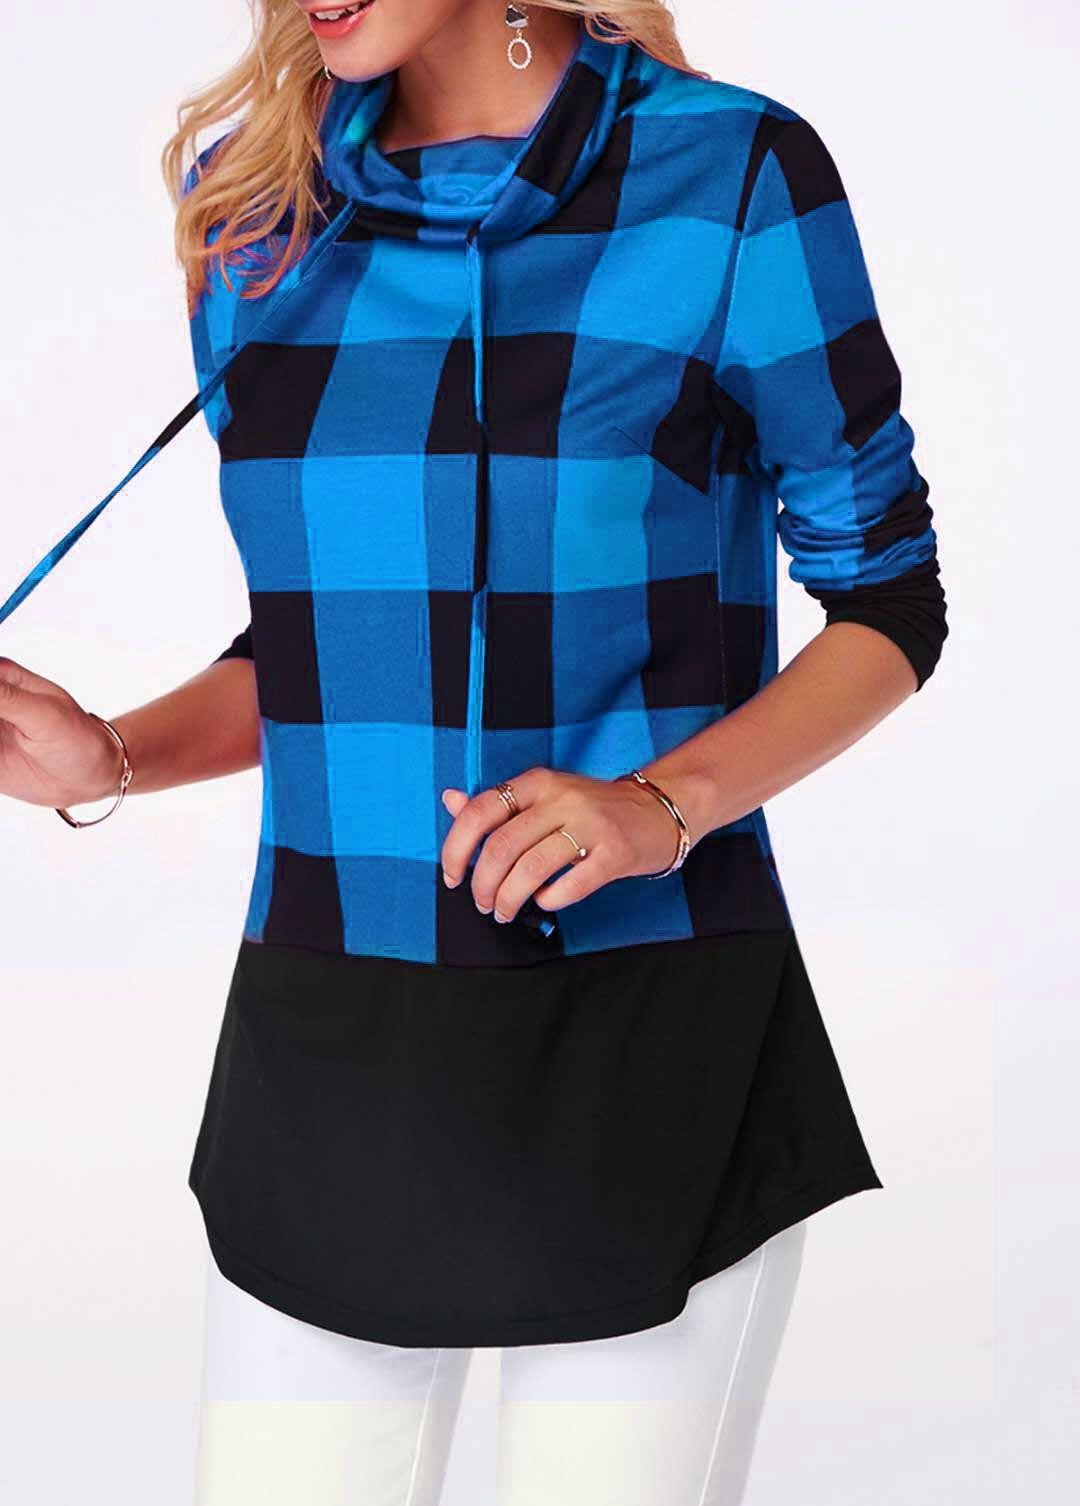 Women's Plaid Print Turtleneck Hoodie, Casual Long Sleeve Women's Plus Size Sweatshirt 10